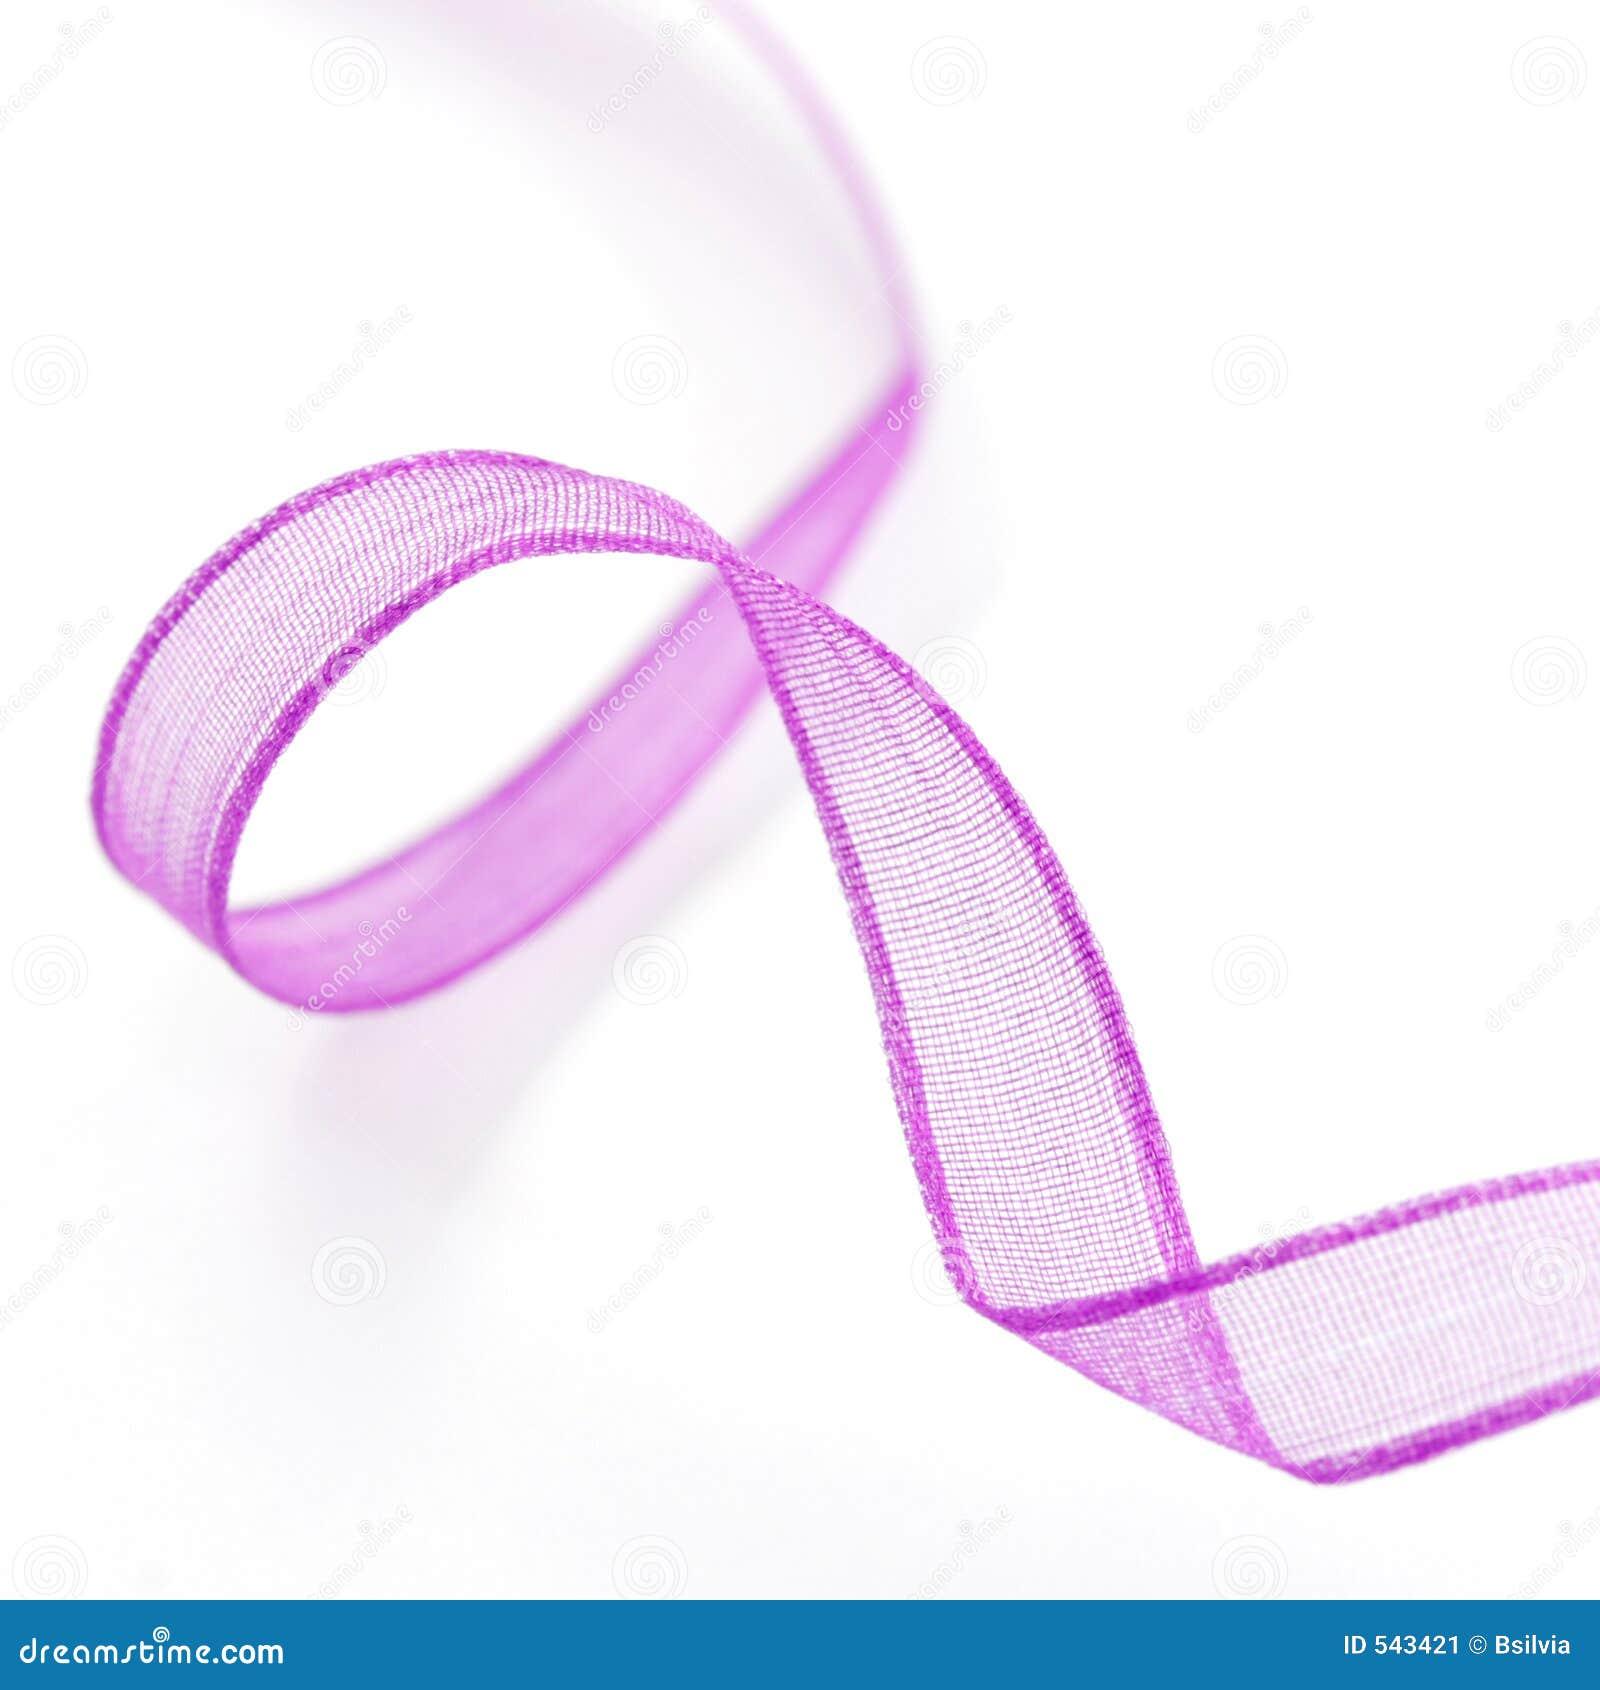 Download 紫色丝带 库存图片. 图片 包括有 丝带, 包裹, 存在, 生日, 空白, 欢乐, 颜色, 场合, 结构, 礼品 - 543421